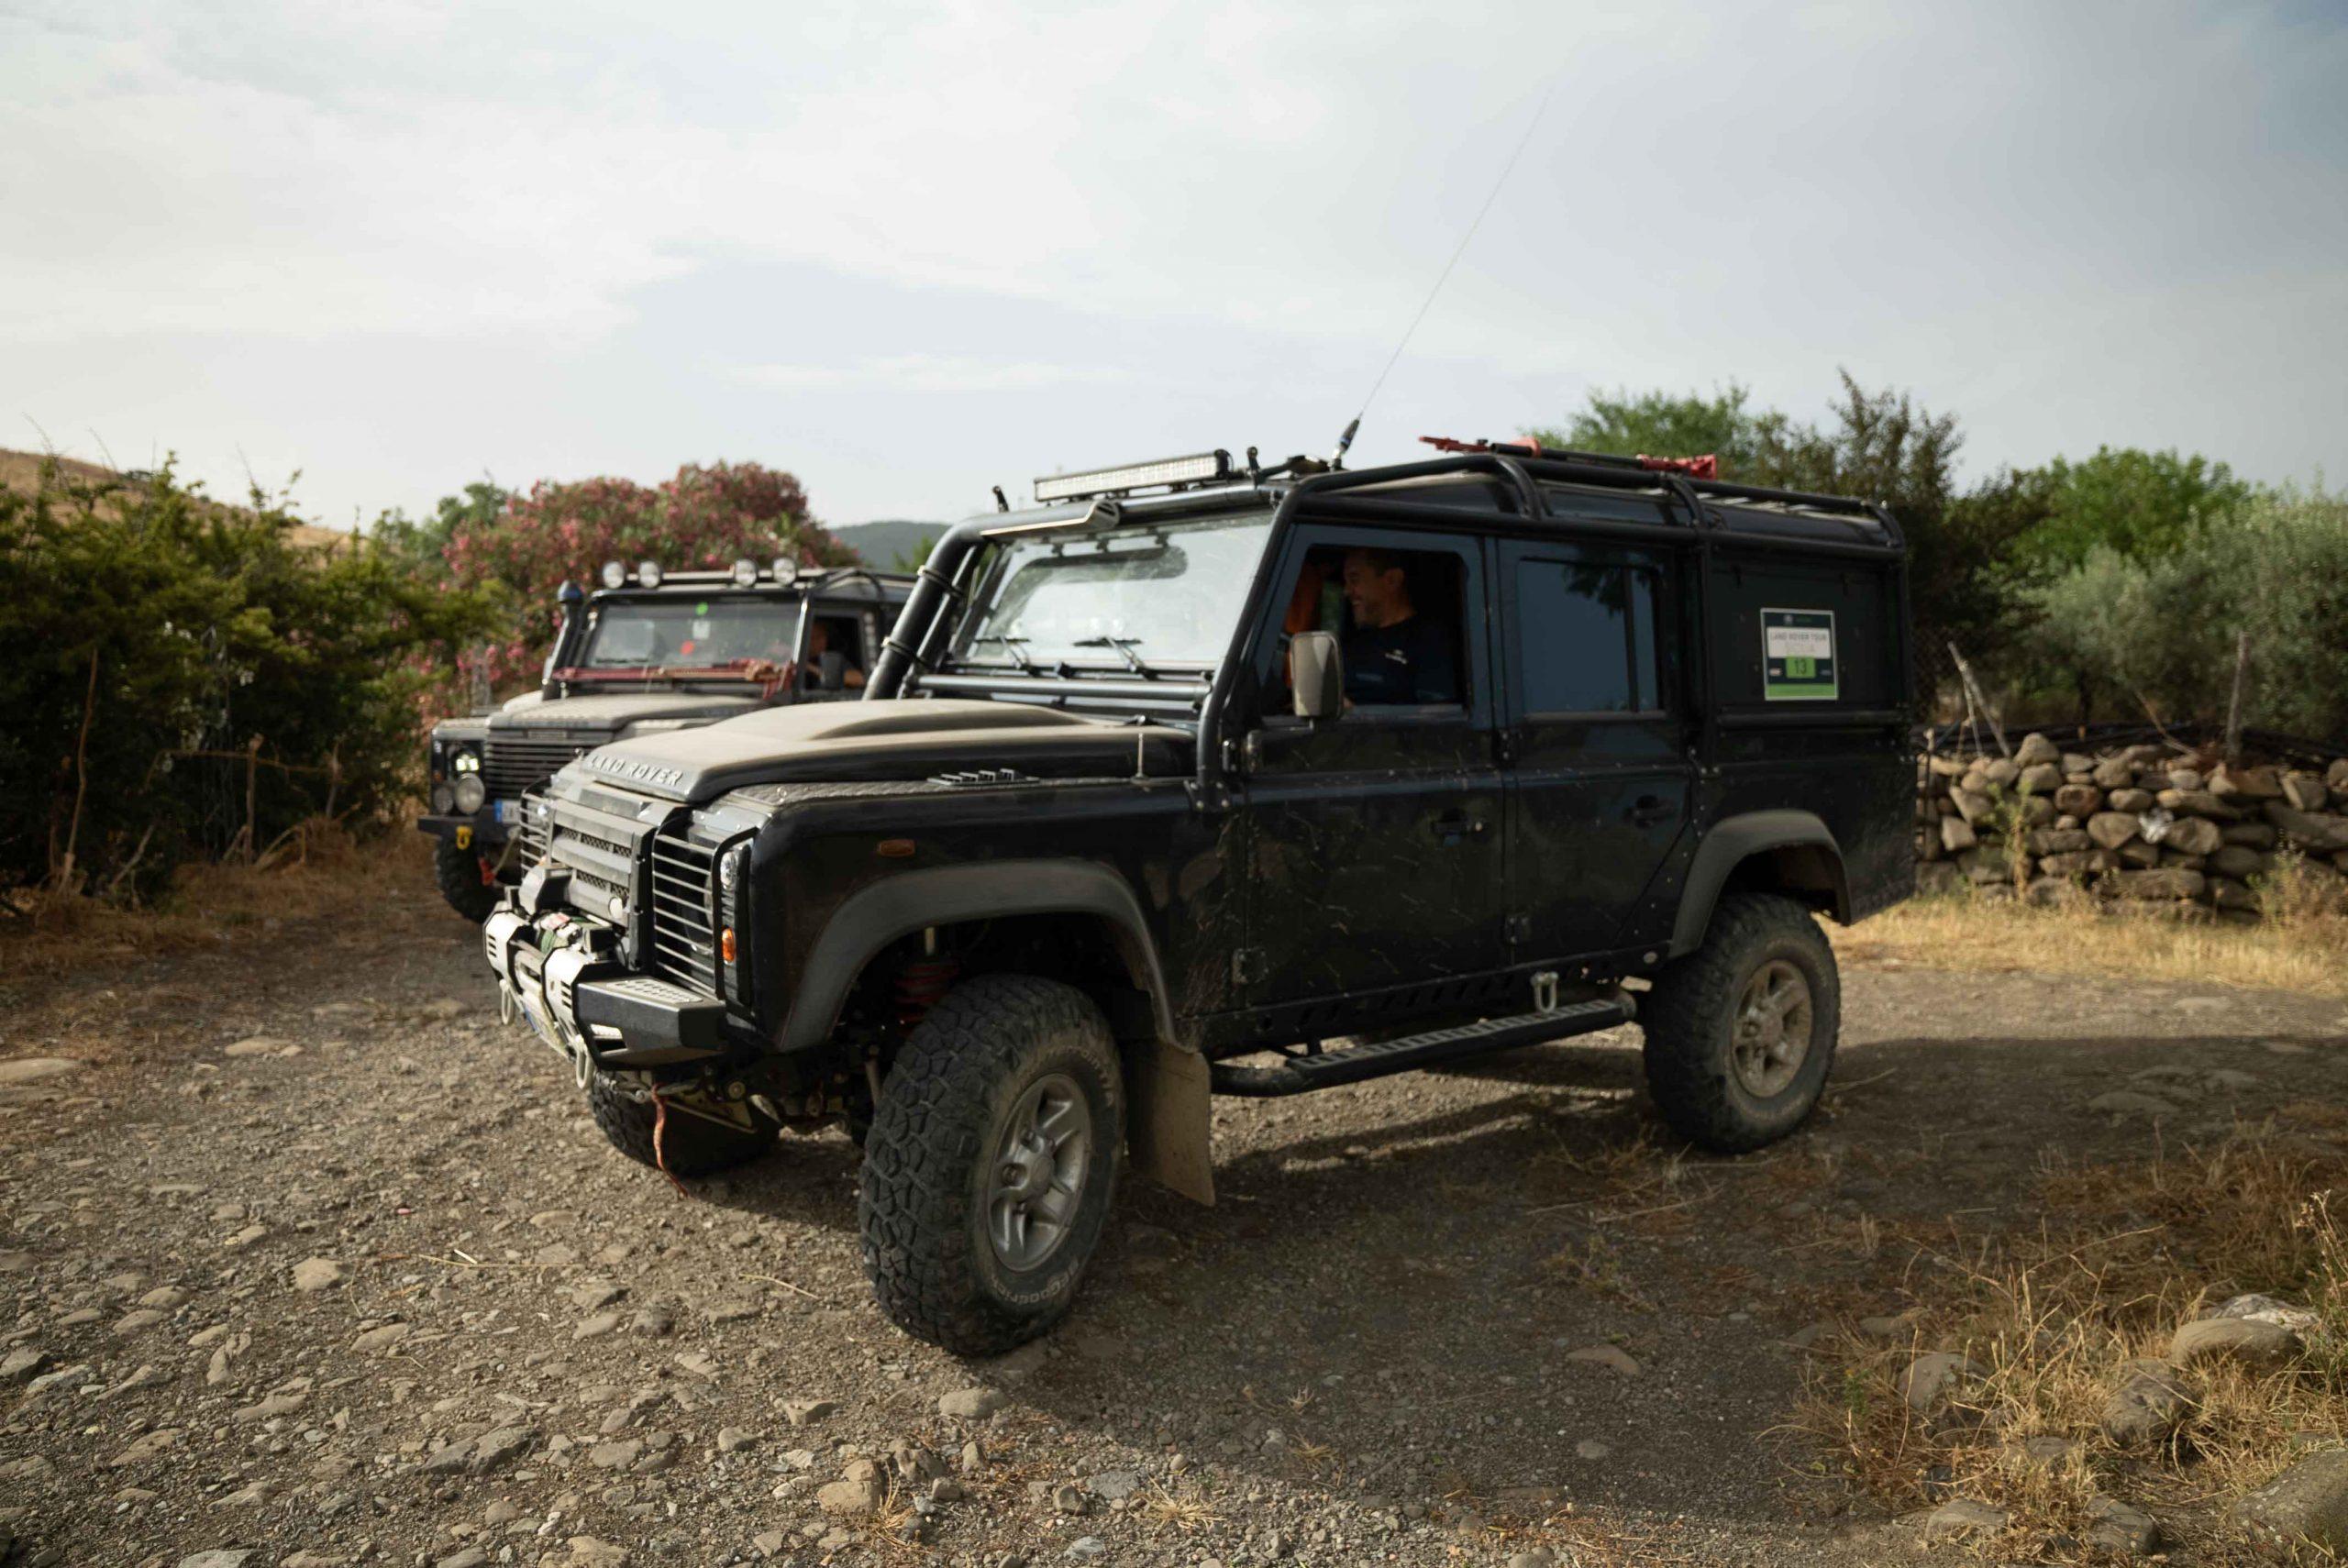 Land_Rover_Tour_Sicilia_2021_Land_Rover_Experience_Italia_-91